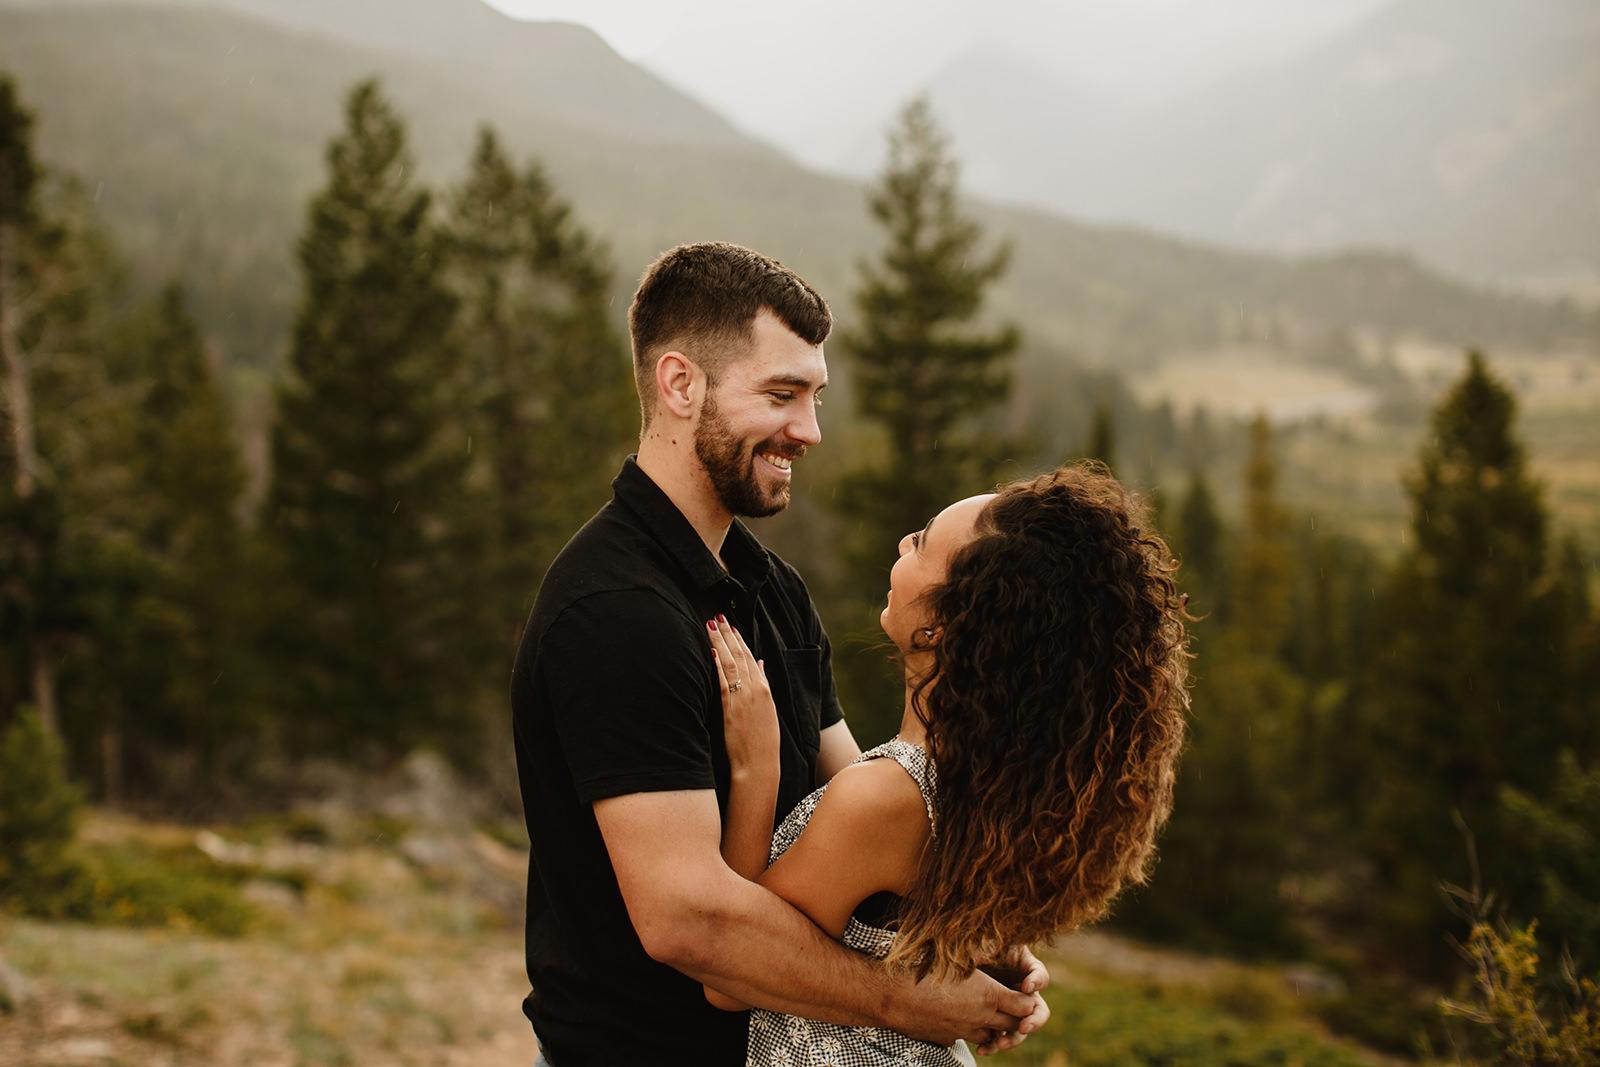 Liz Osban Photography Cheyenne Wyoming Engagement Wedding Photographer couple adventure elopement wedding laramie denver fort collins colorado rocky mountain national park2.jpg